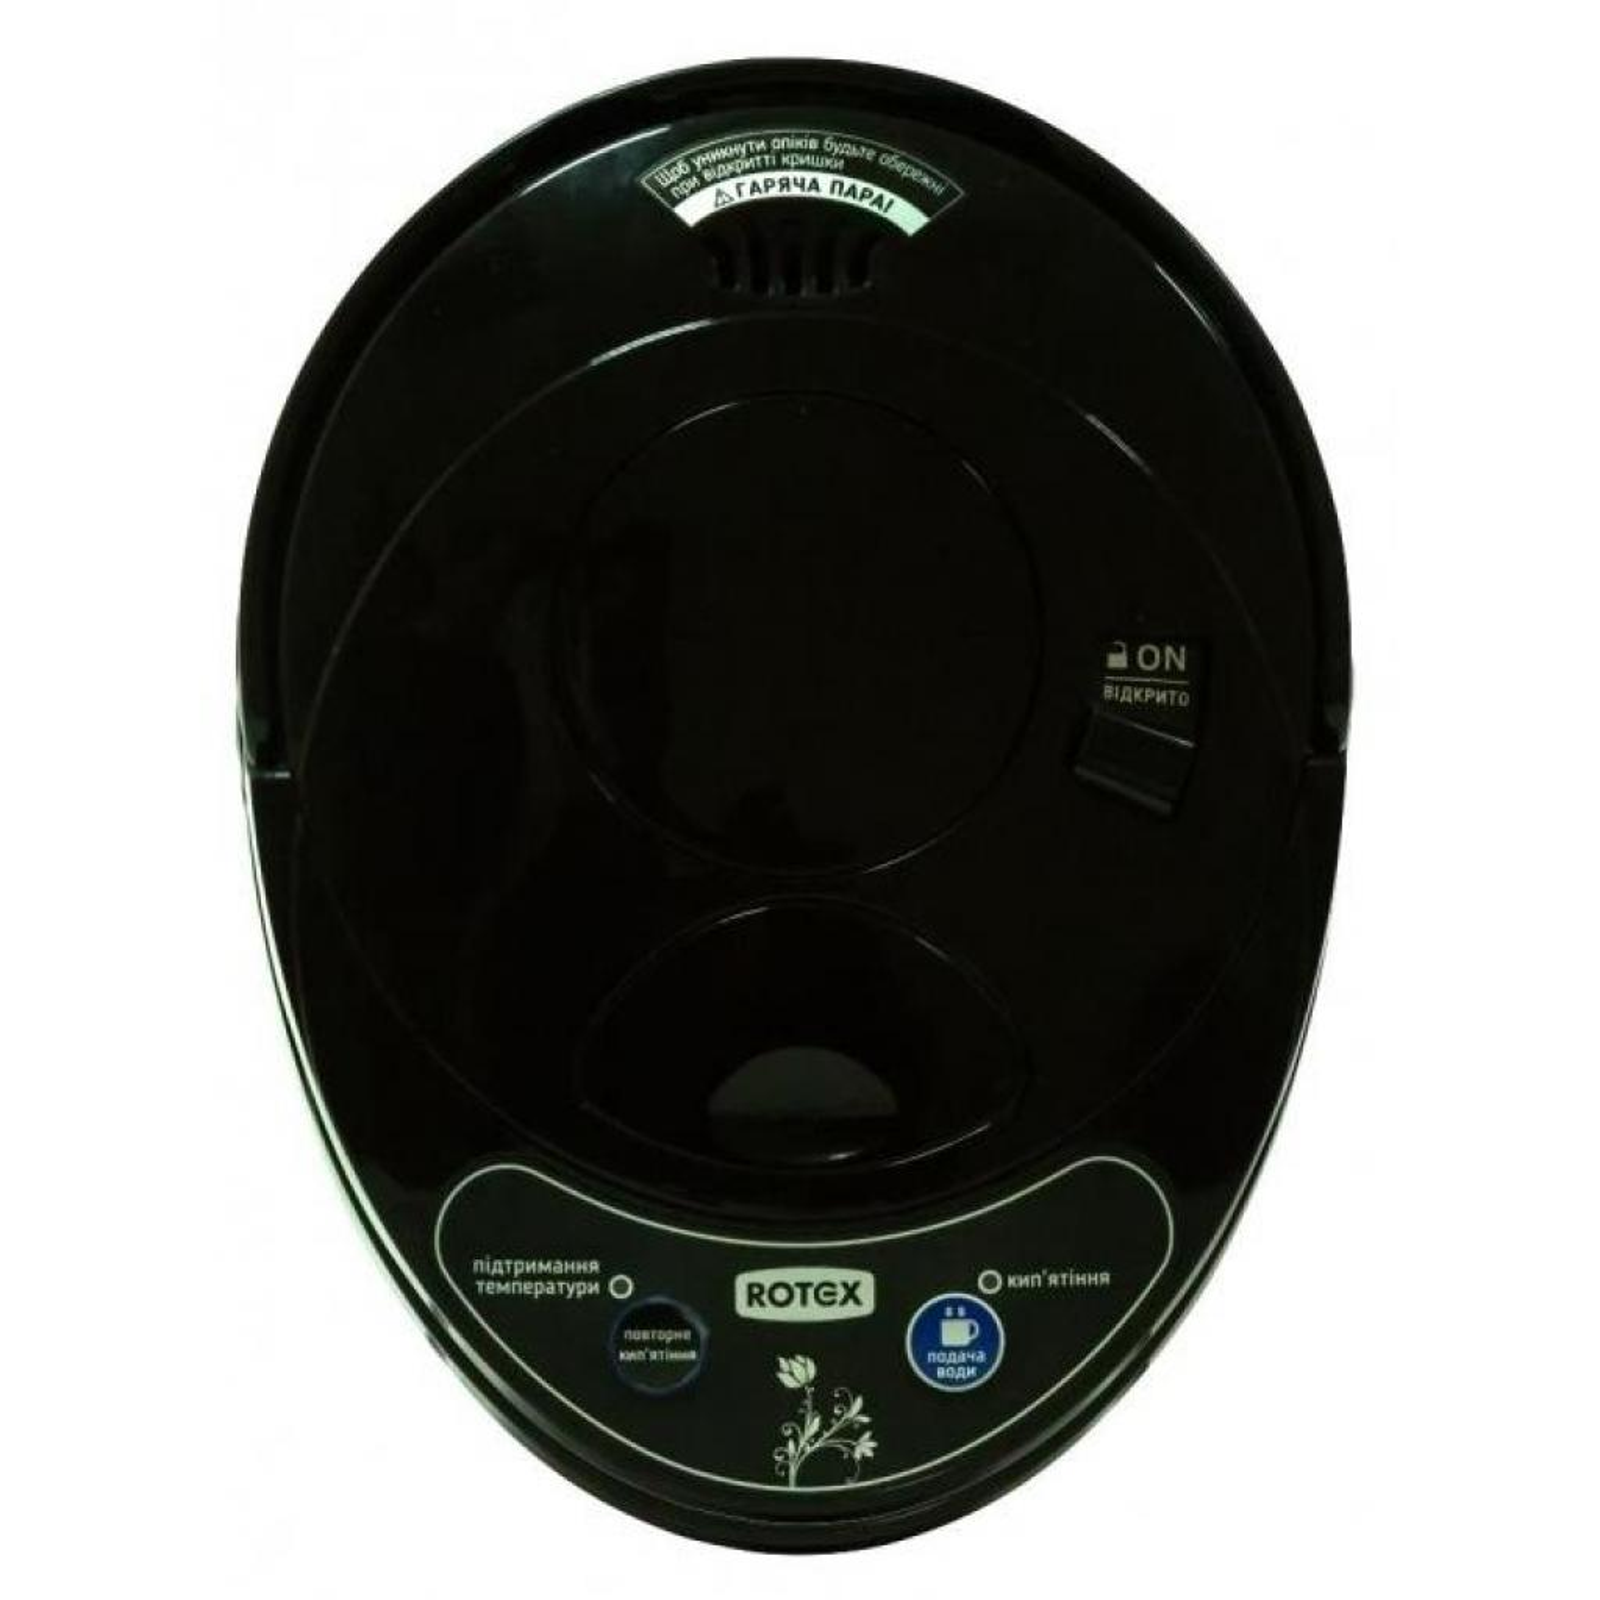 Электрочайник Rotex RTP350-U изображение 3